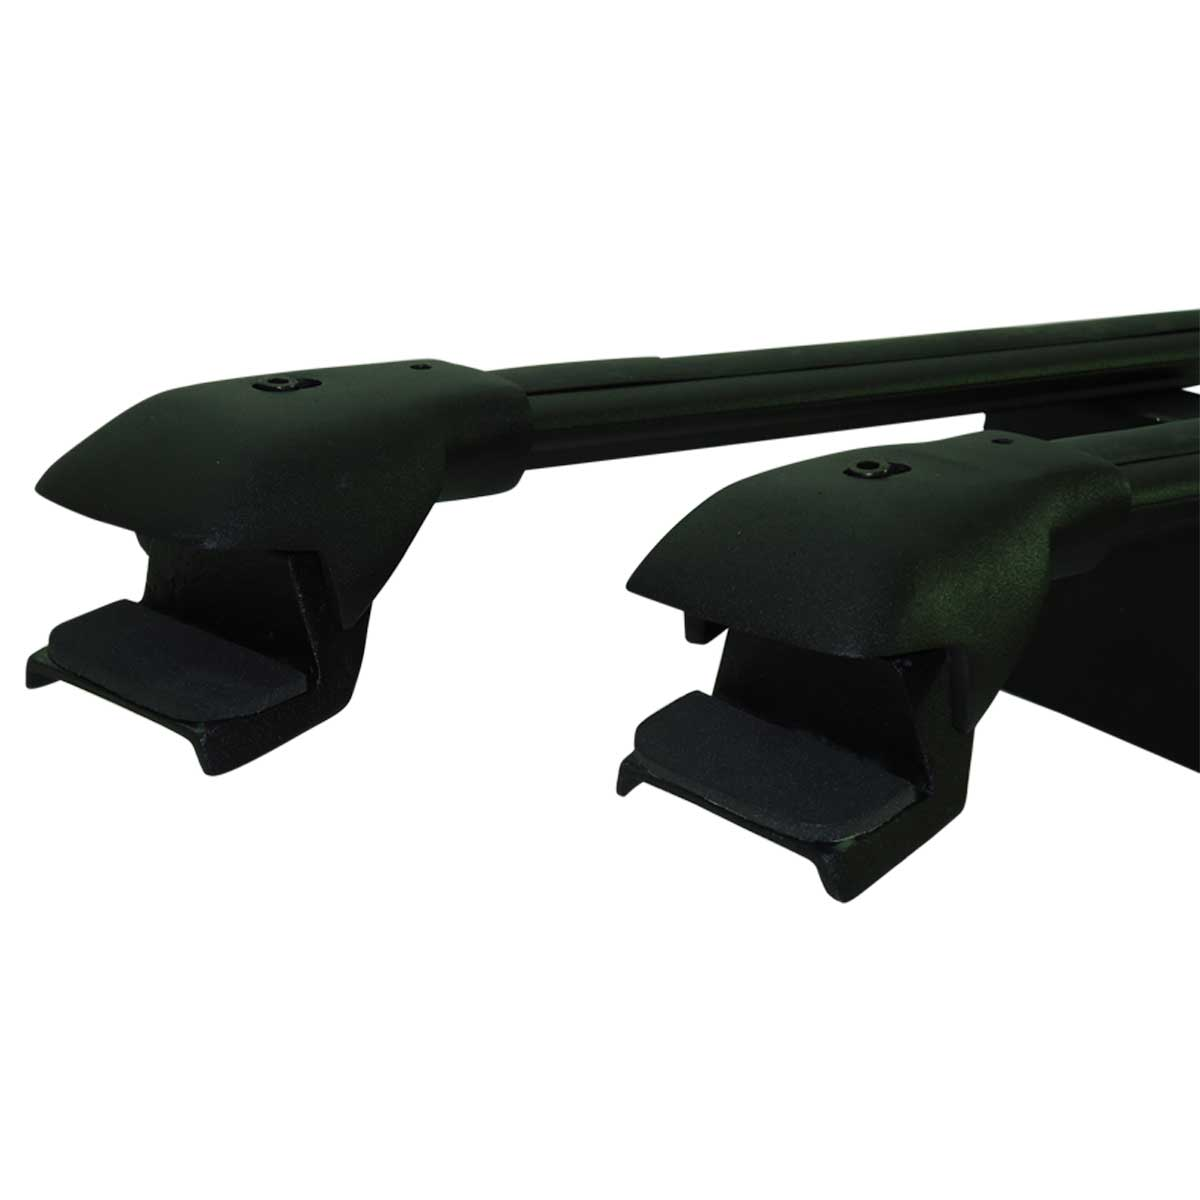 Travessa rack de teto larga preta alumínio Palio Weekend Adventure 2009 a 2012 ou Weekend Adventure 2013 a 2018